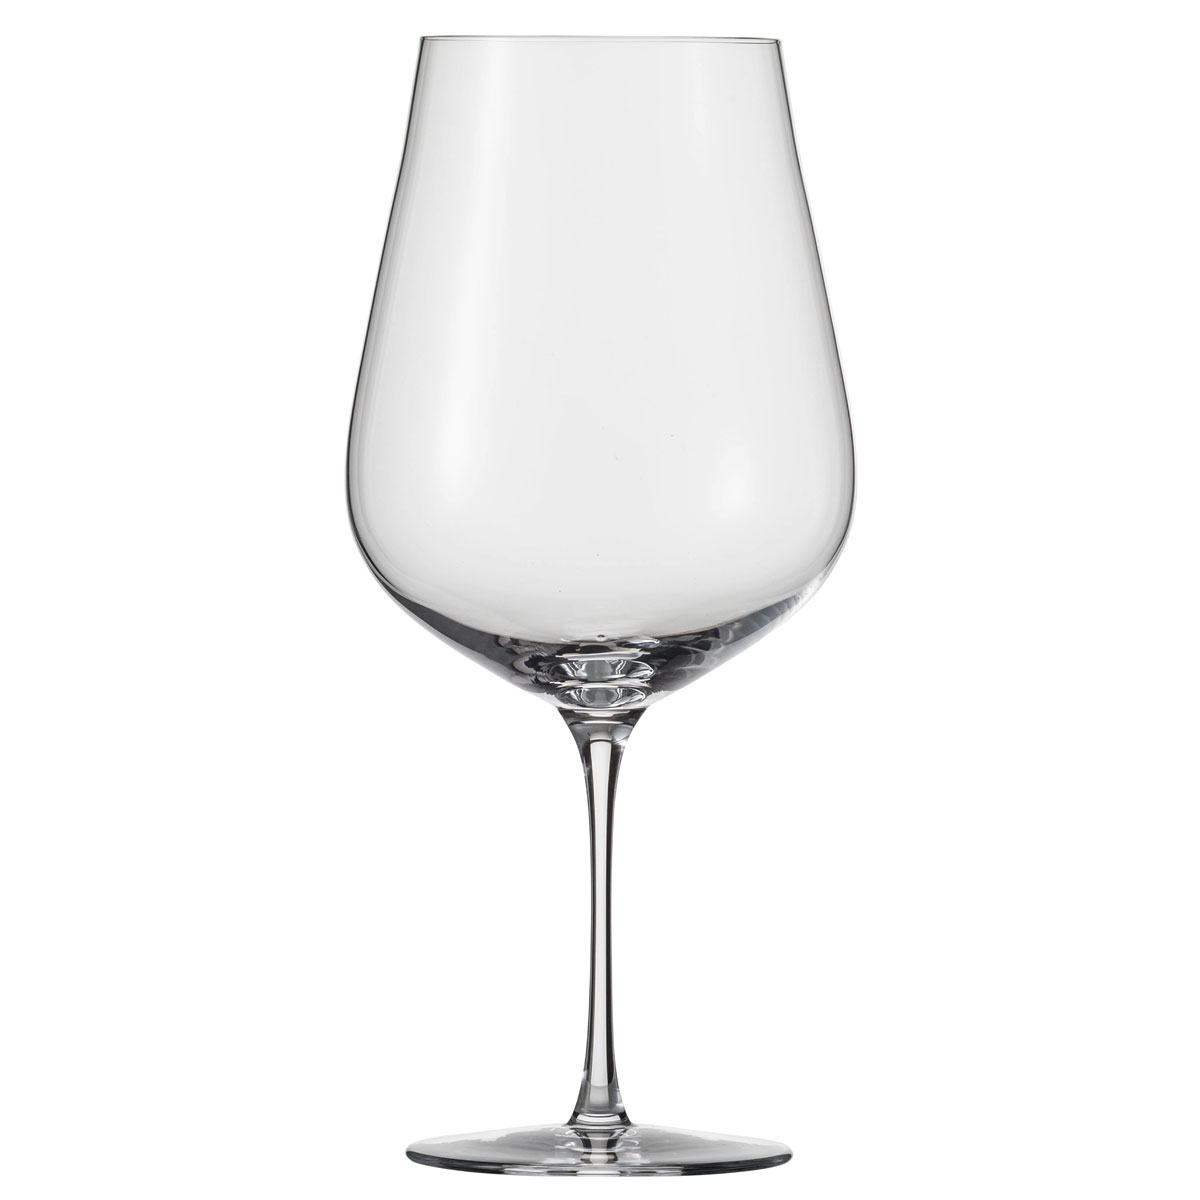 Schott Zwiesel Tritan Crystal, Air Bordeaux, Cabernet Glass, Single